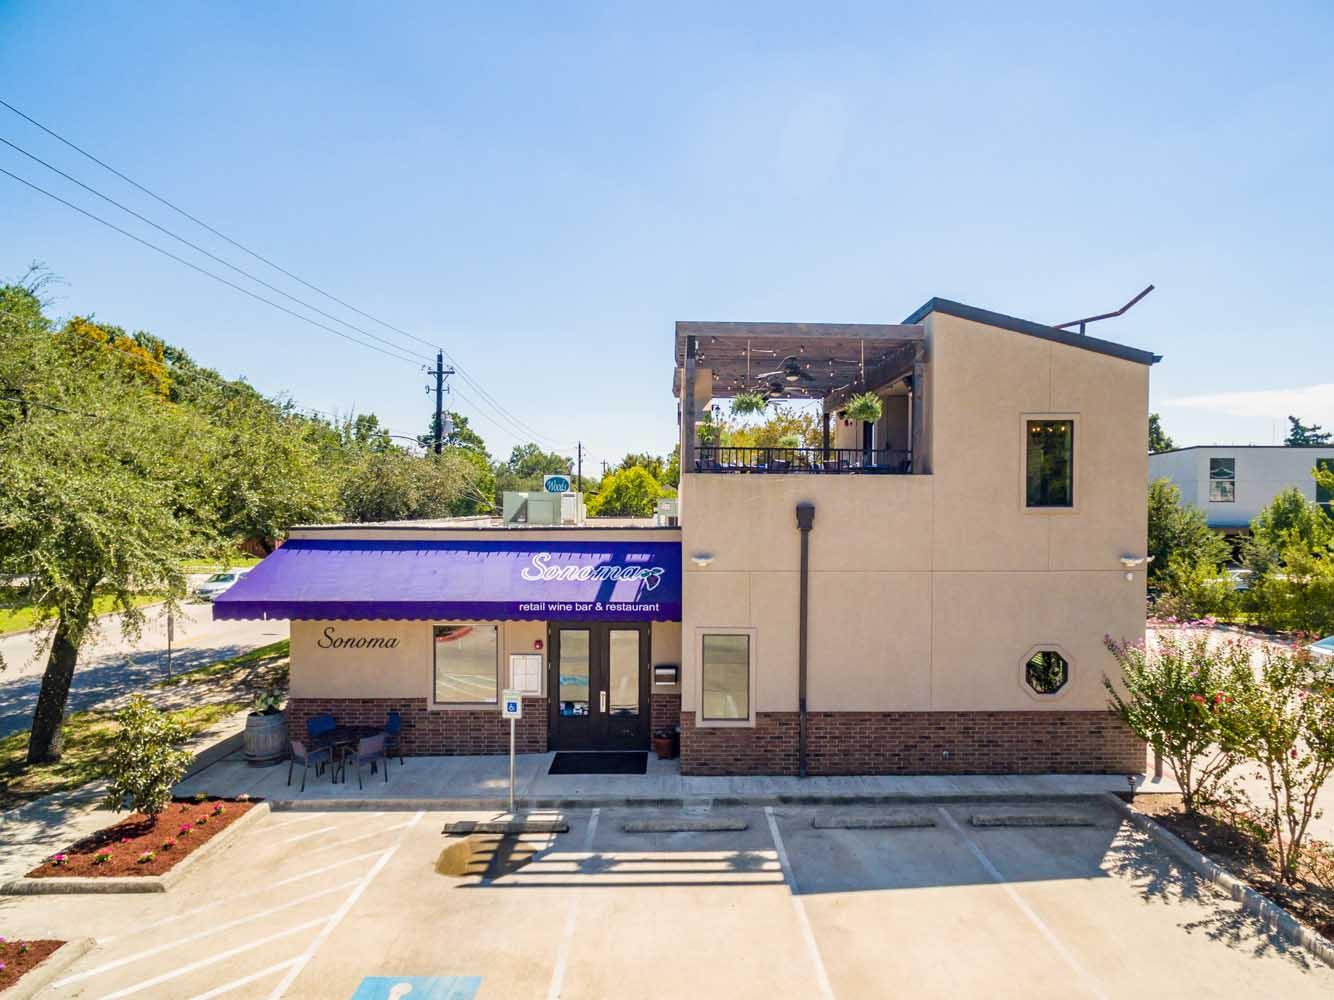 Sonoma restaurant houston